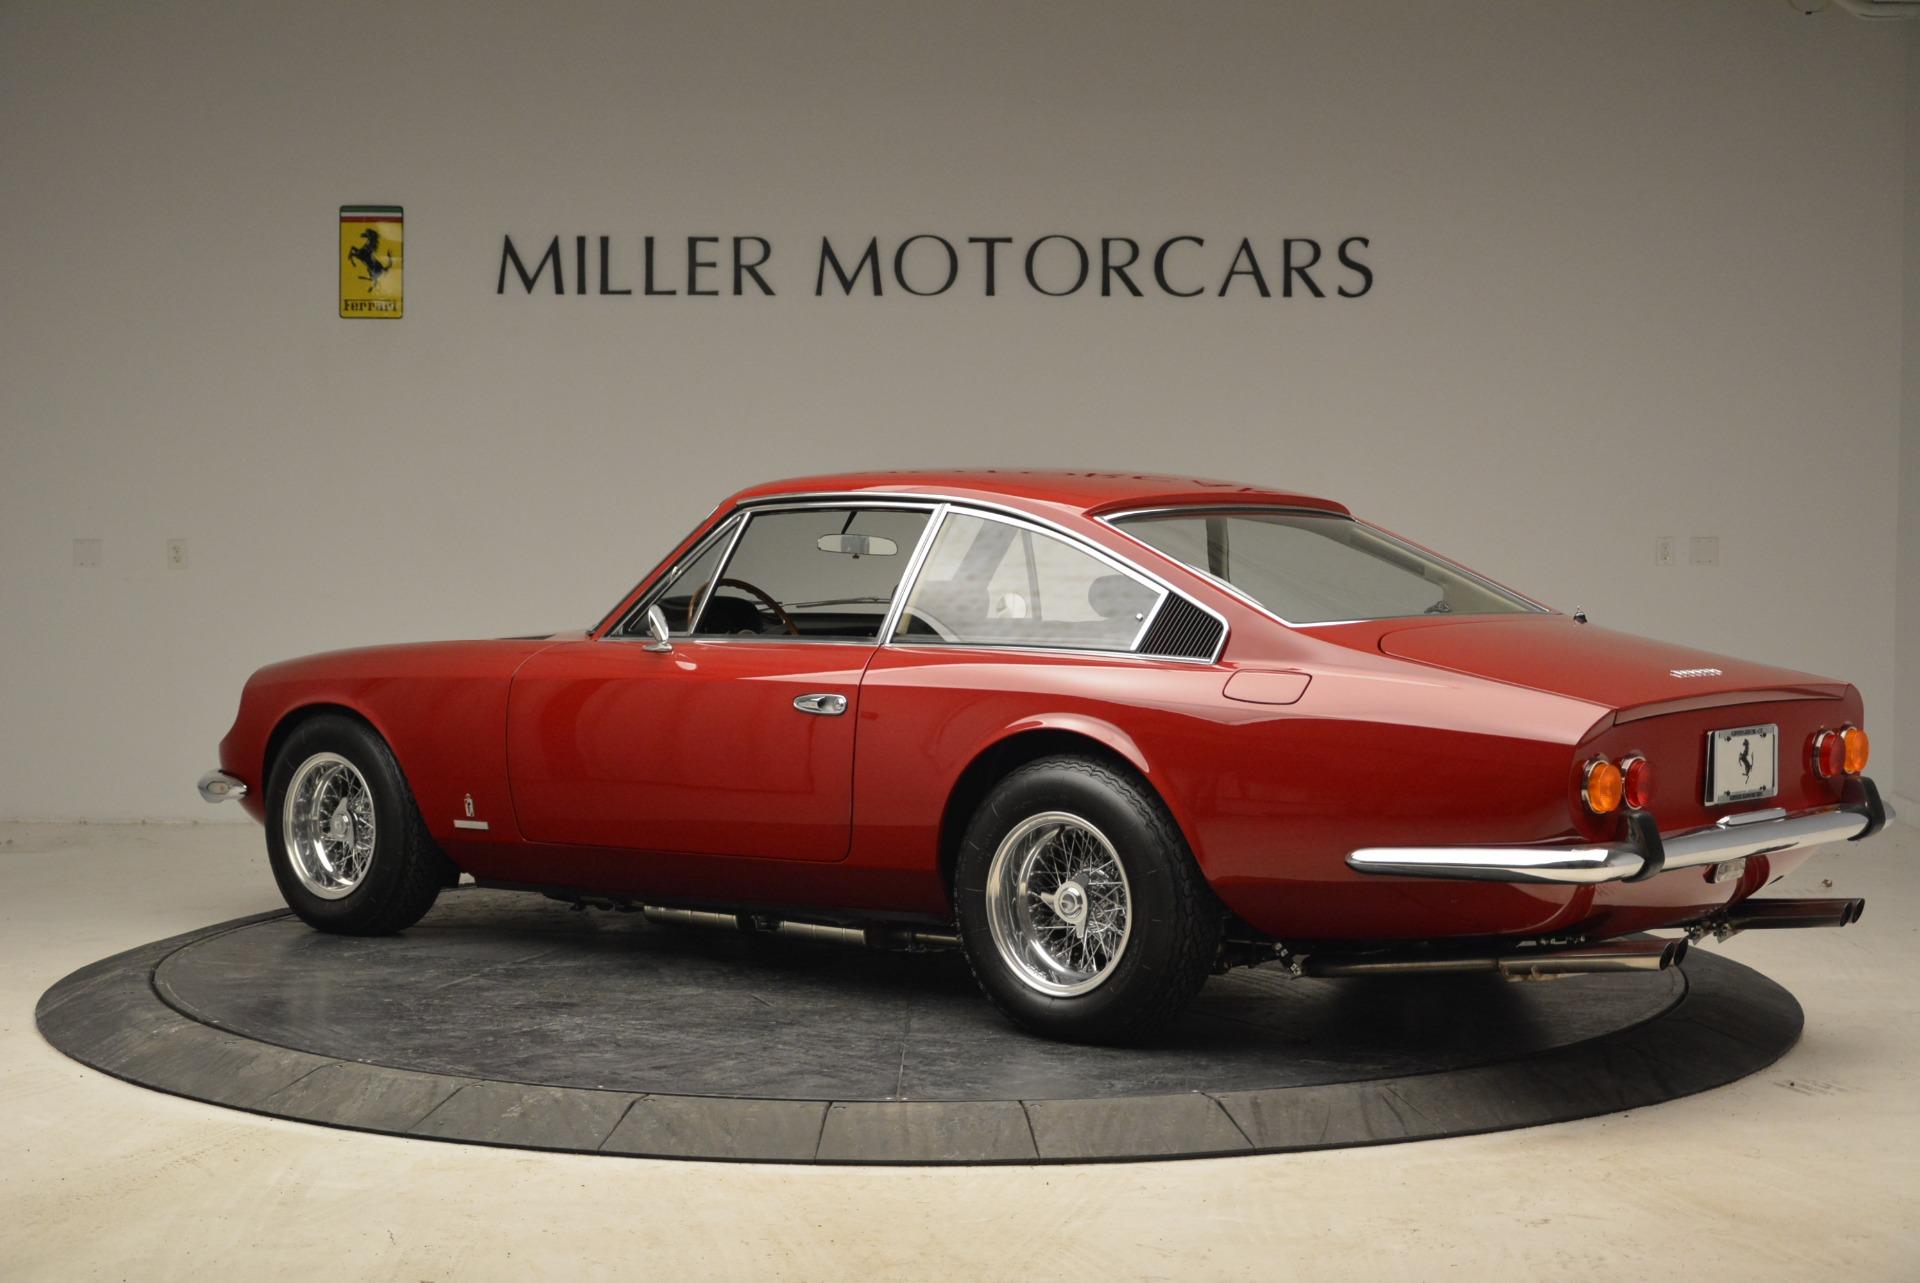 Used 1969 Ferrari 365 GT 2+2  For Sale In Greenwich, CT. Alfa Romeo of Greenwich, 4424 1995_p4